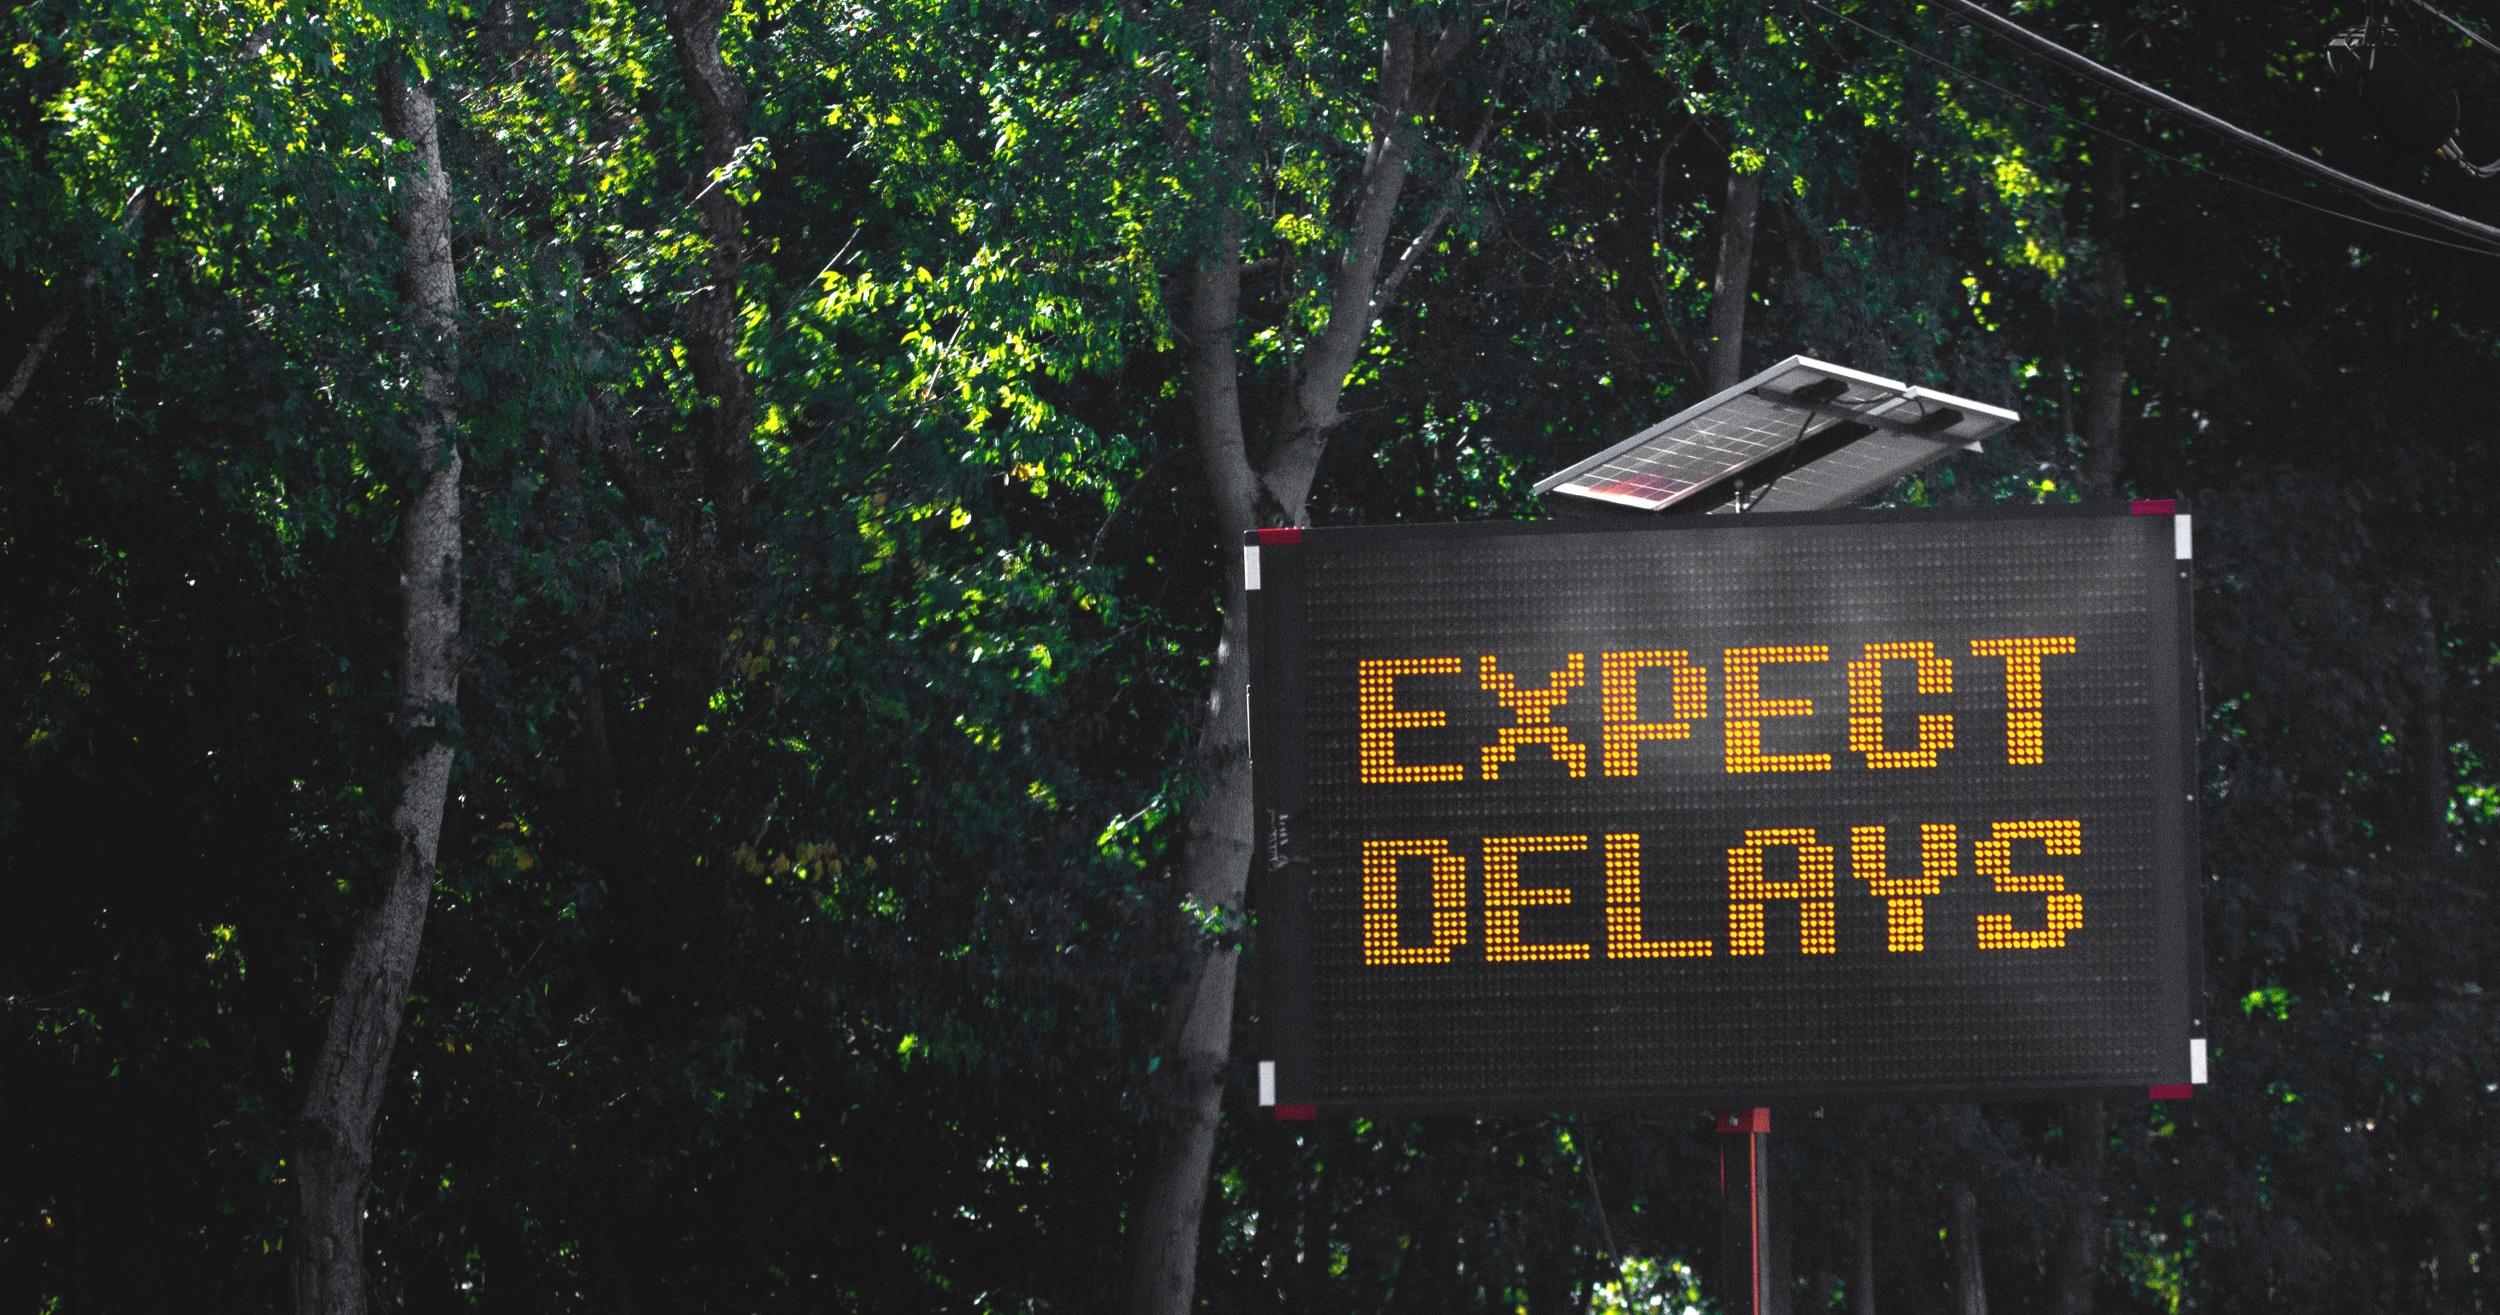 expect+delays.jpg